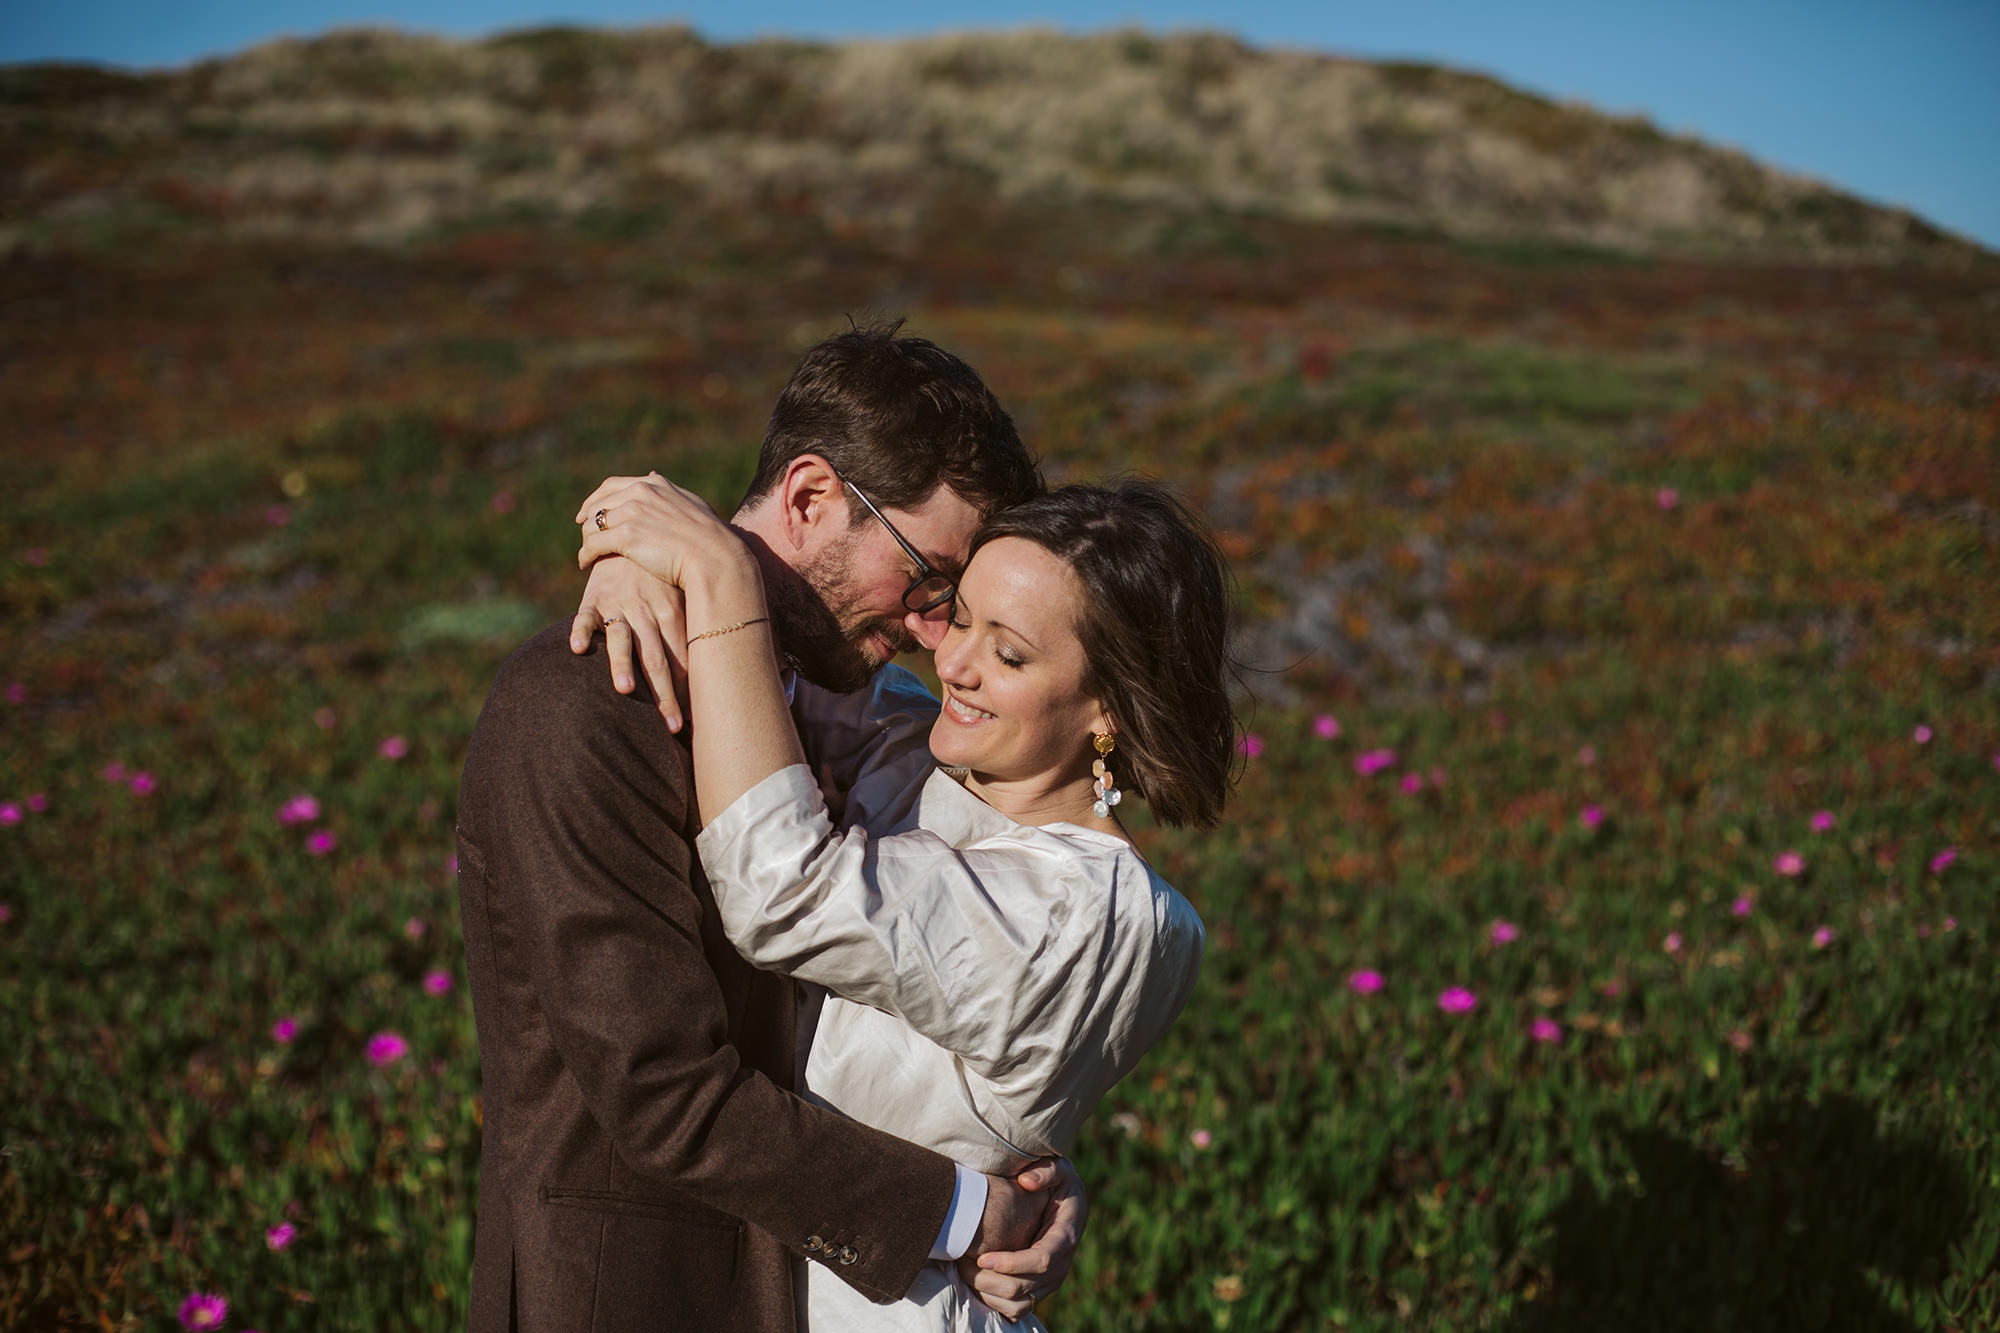 Groom hugs bride for for Point Reyes Elopement.